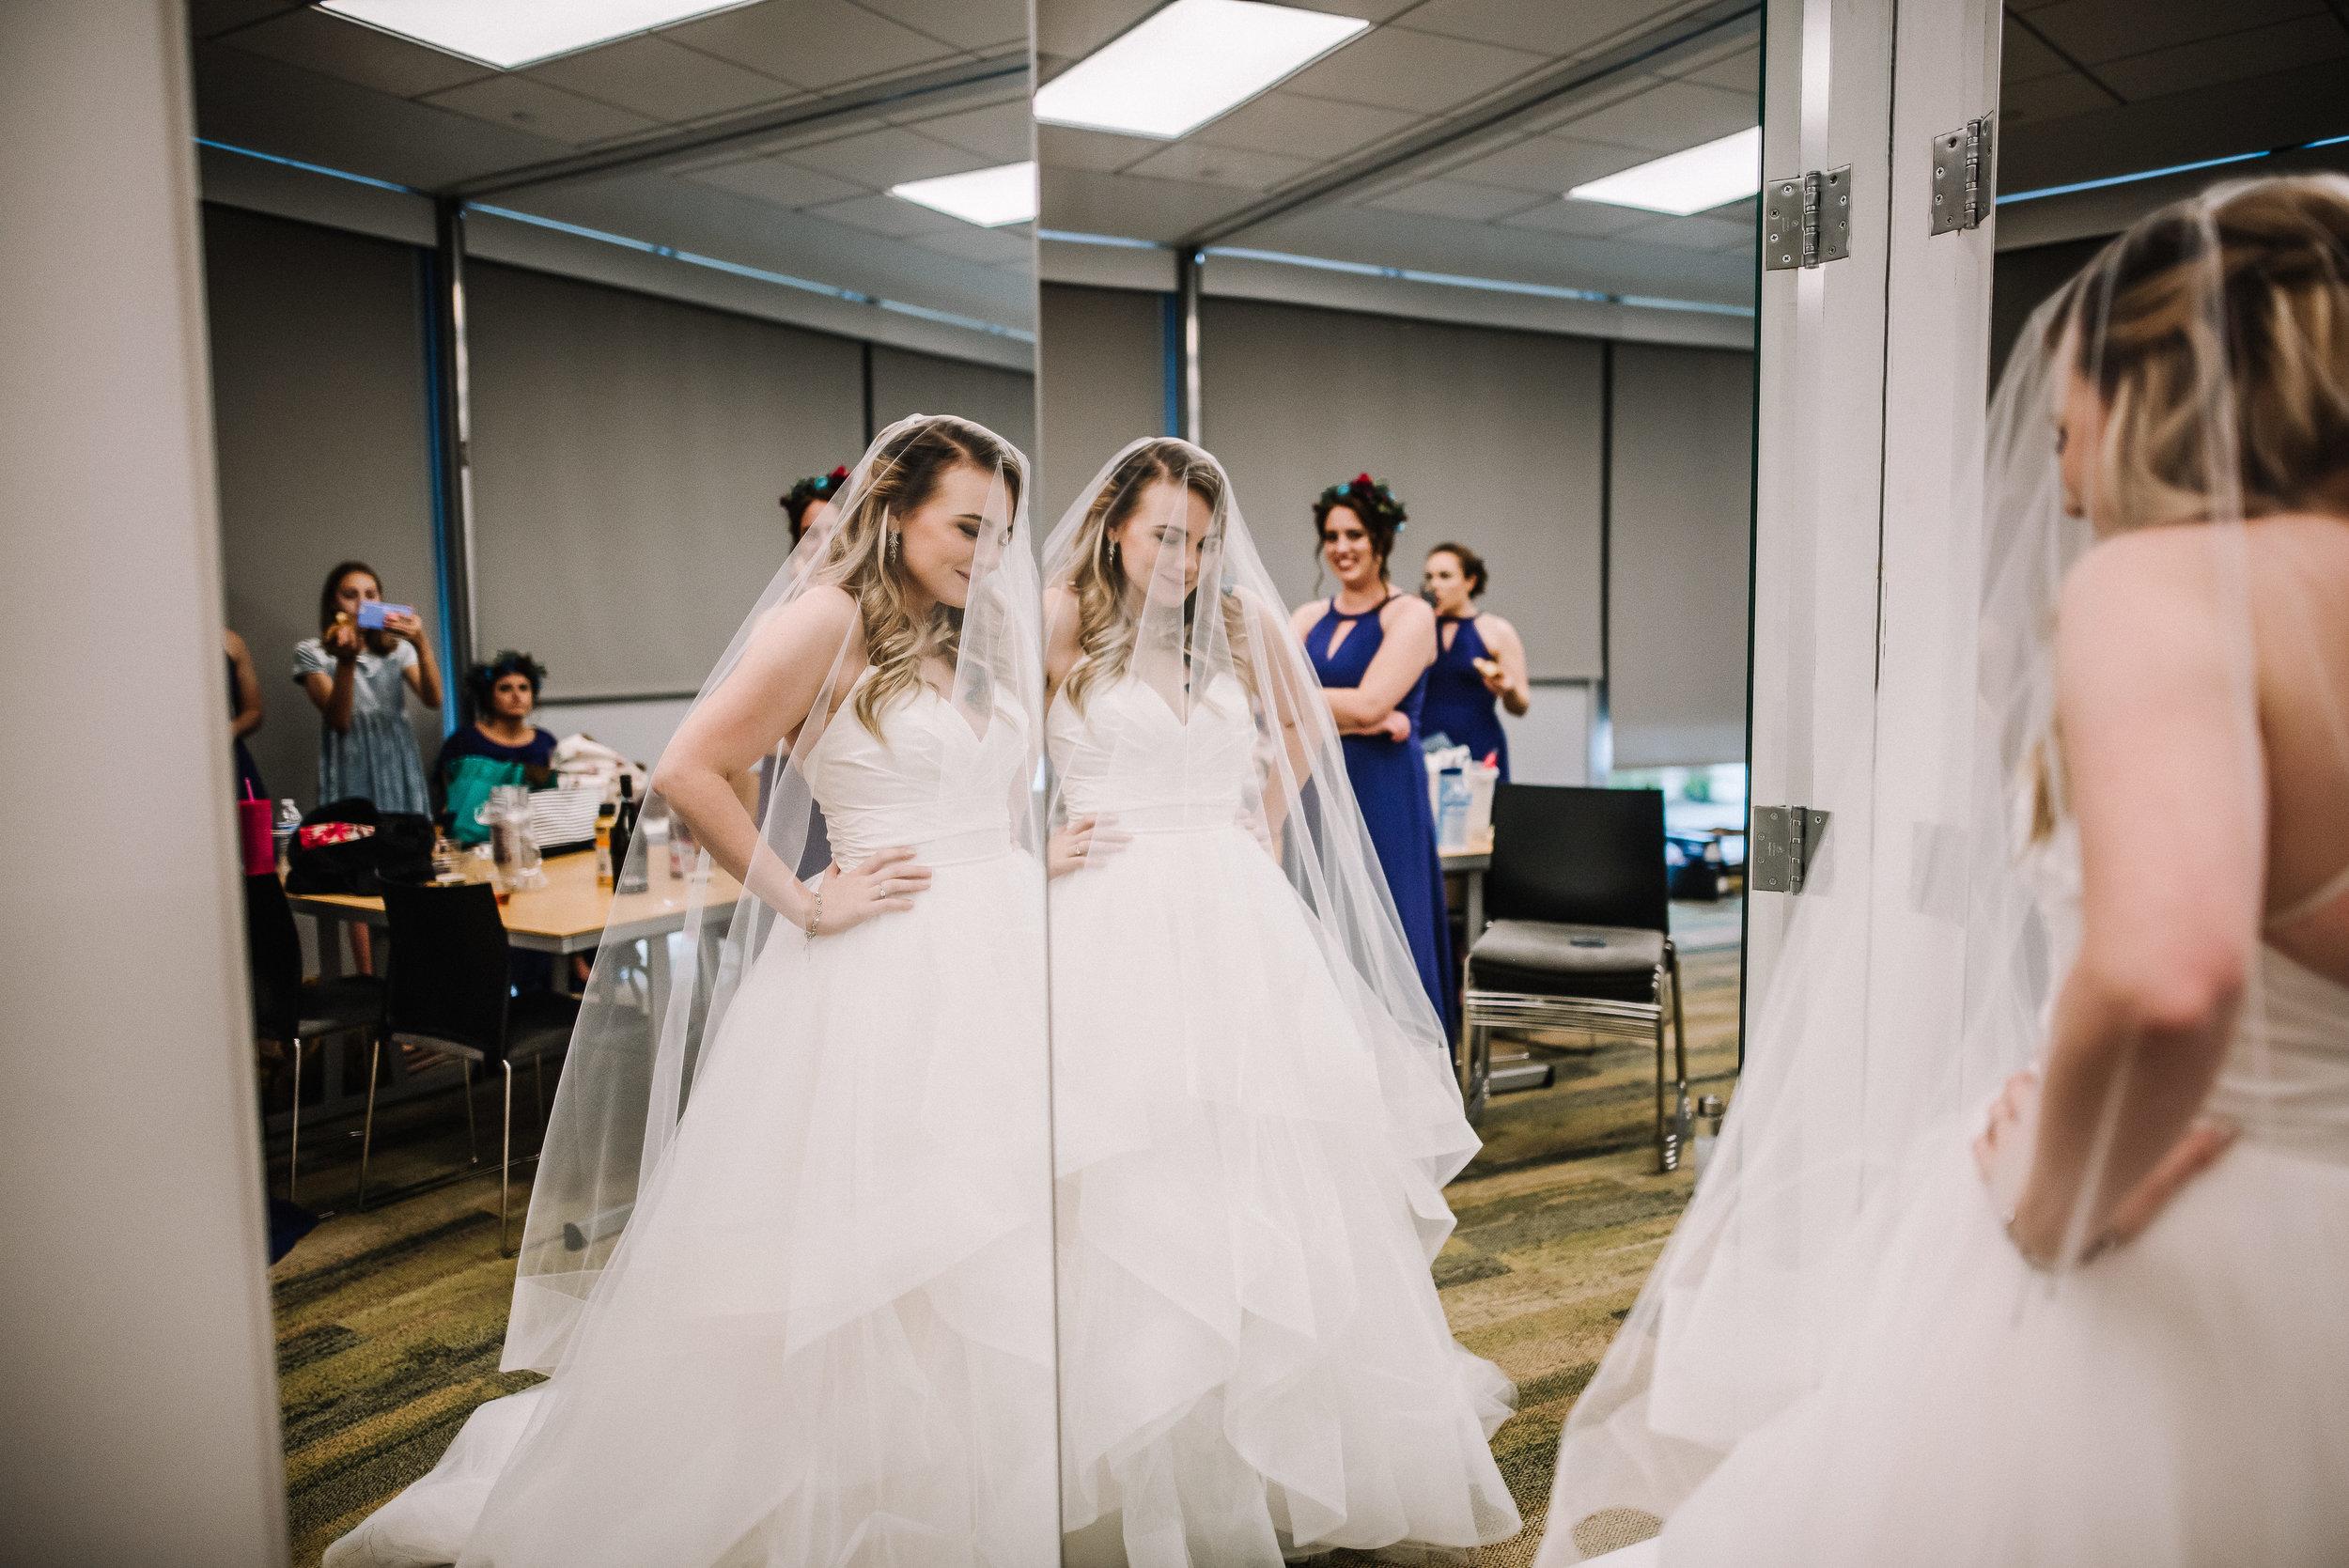 Lucchesi-Wedding_Shelby-Farms_Ashley-Benham-Photography-101.jpg